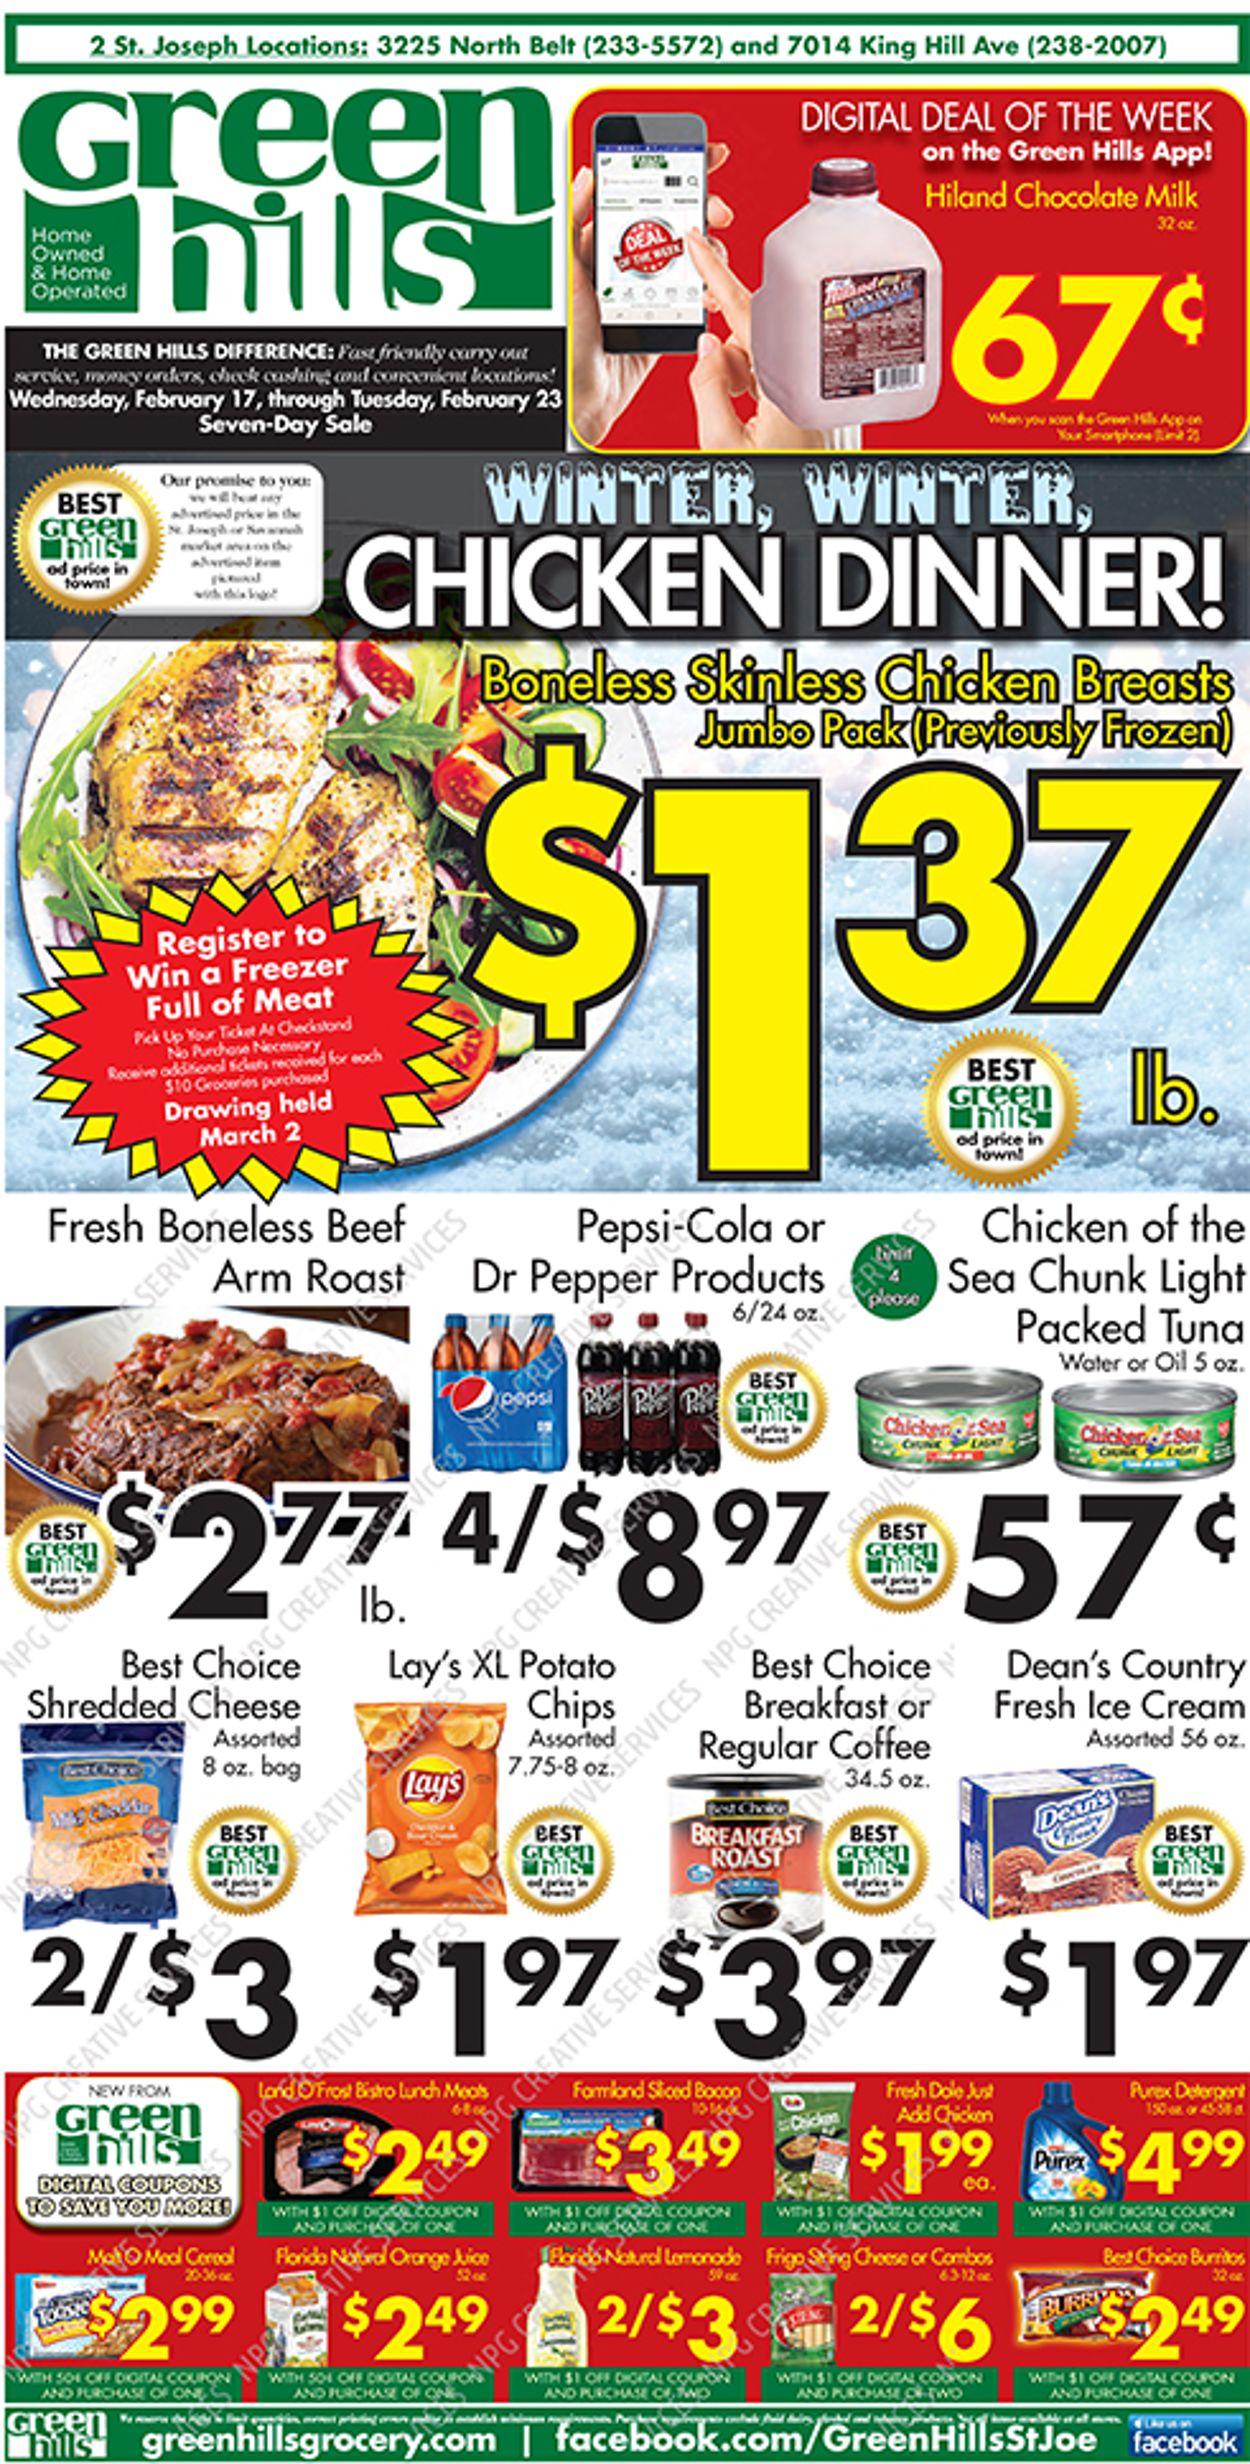 Green Hills Grocery Weekly Ad Circular - valid 02/17-02/23/2021